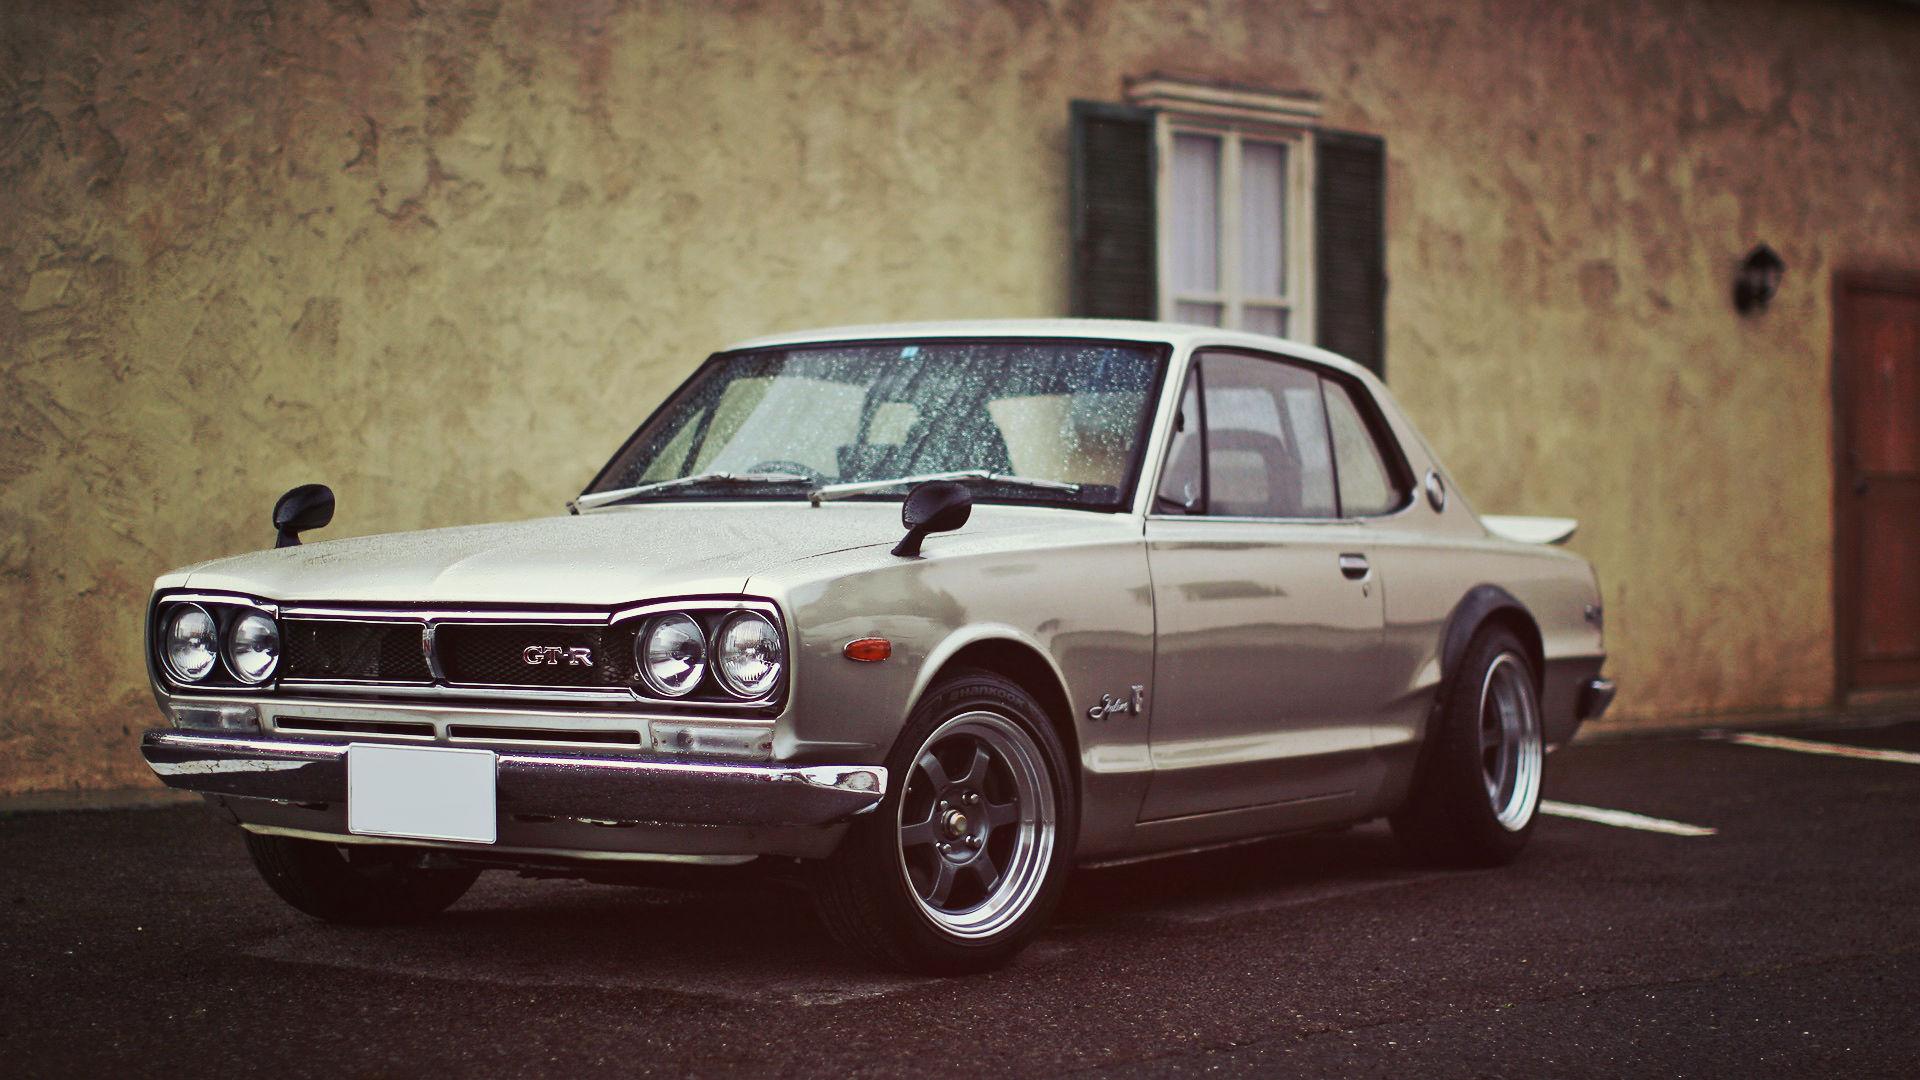 Daily classic #5: 1969 Nissan Skyline 2000GT-R